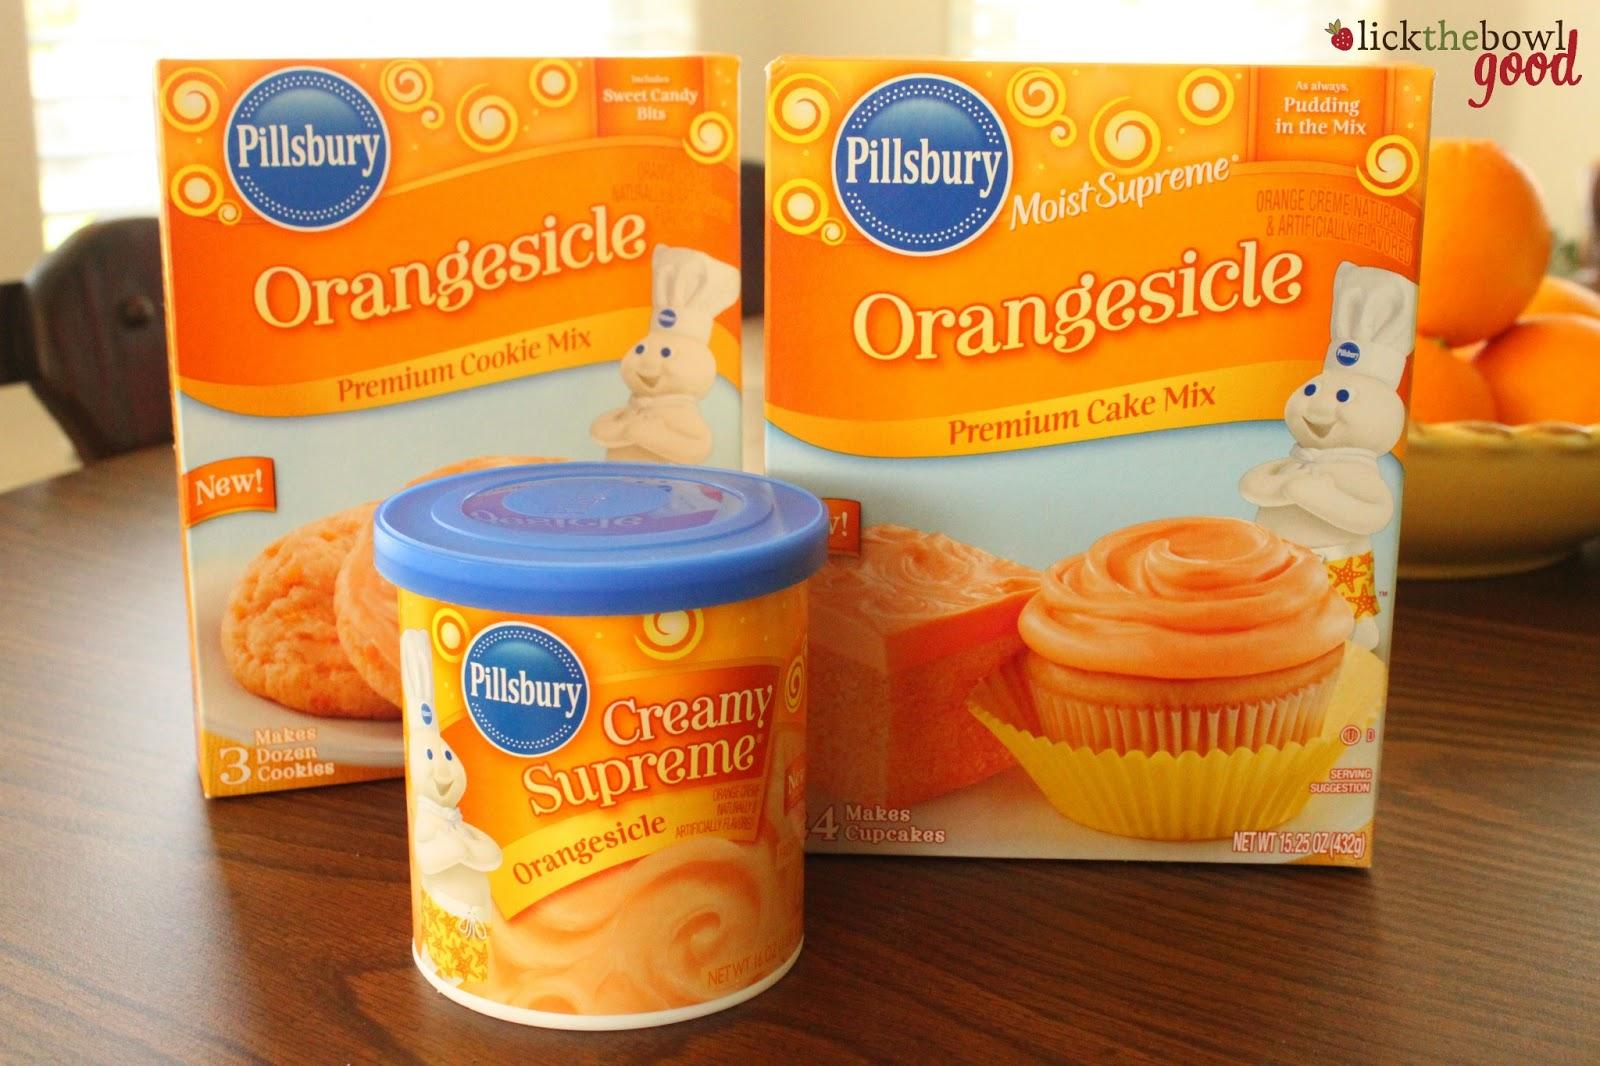 Pillsbury Creamsicle Cake Mix